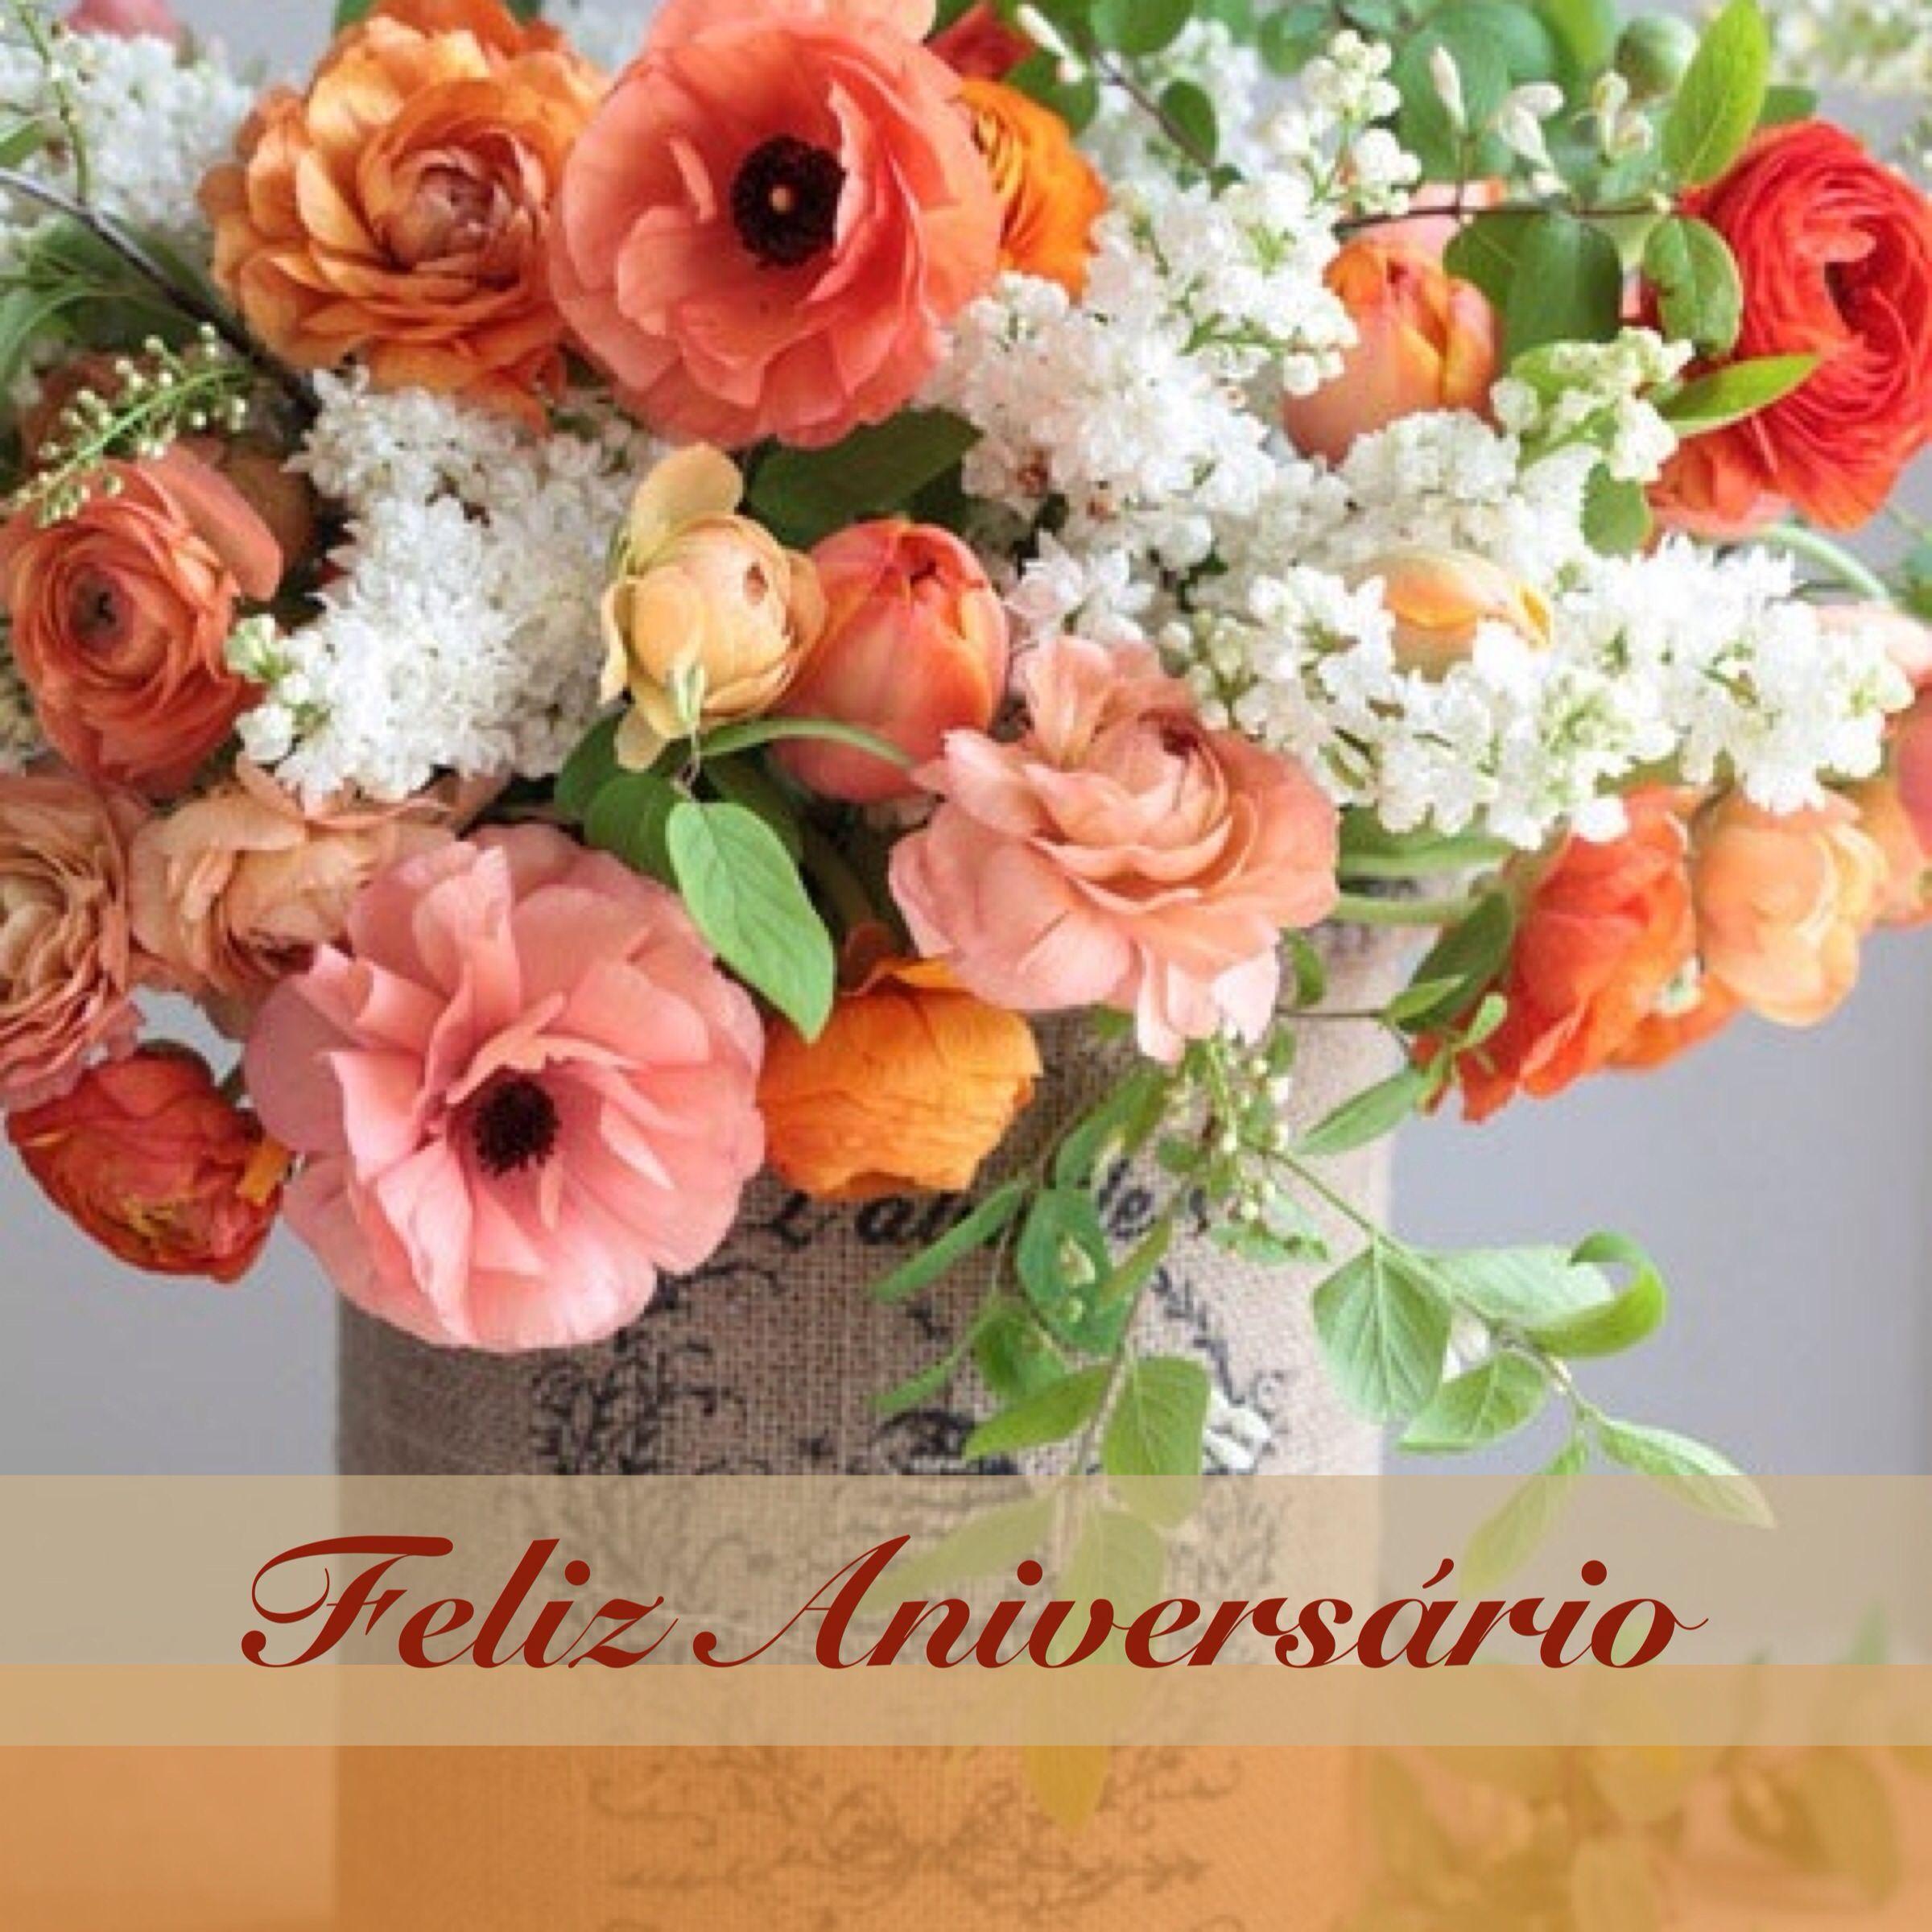 Image result for Feliz aniversario signs pictures